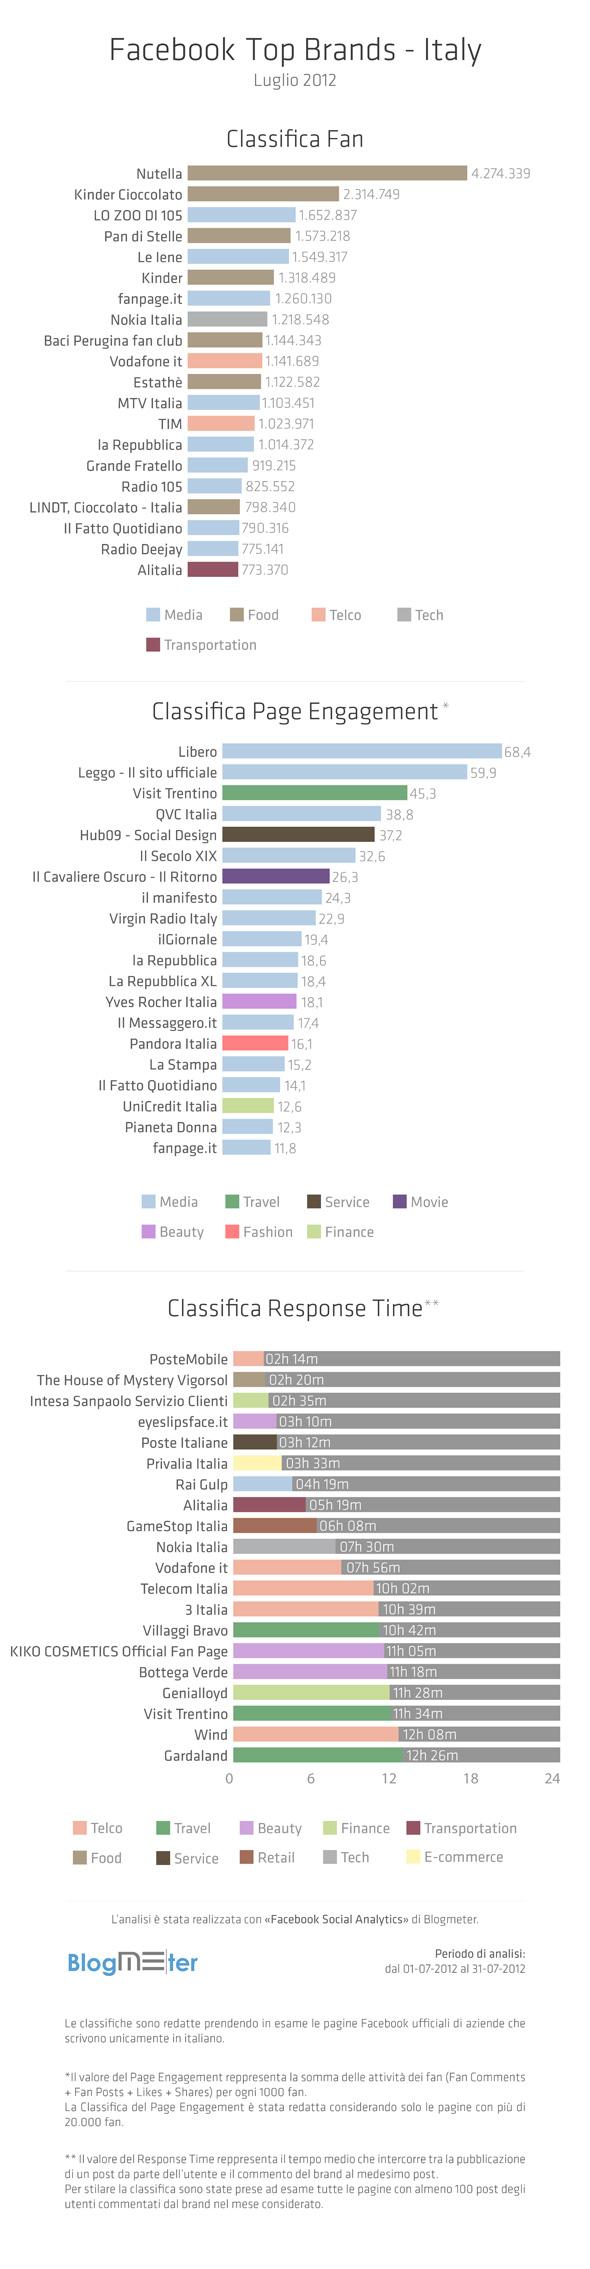 TopBrands_Luglio-2012 - BlogMeter